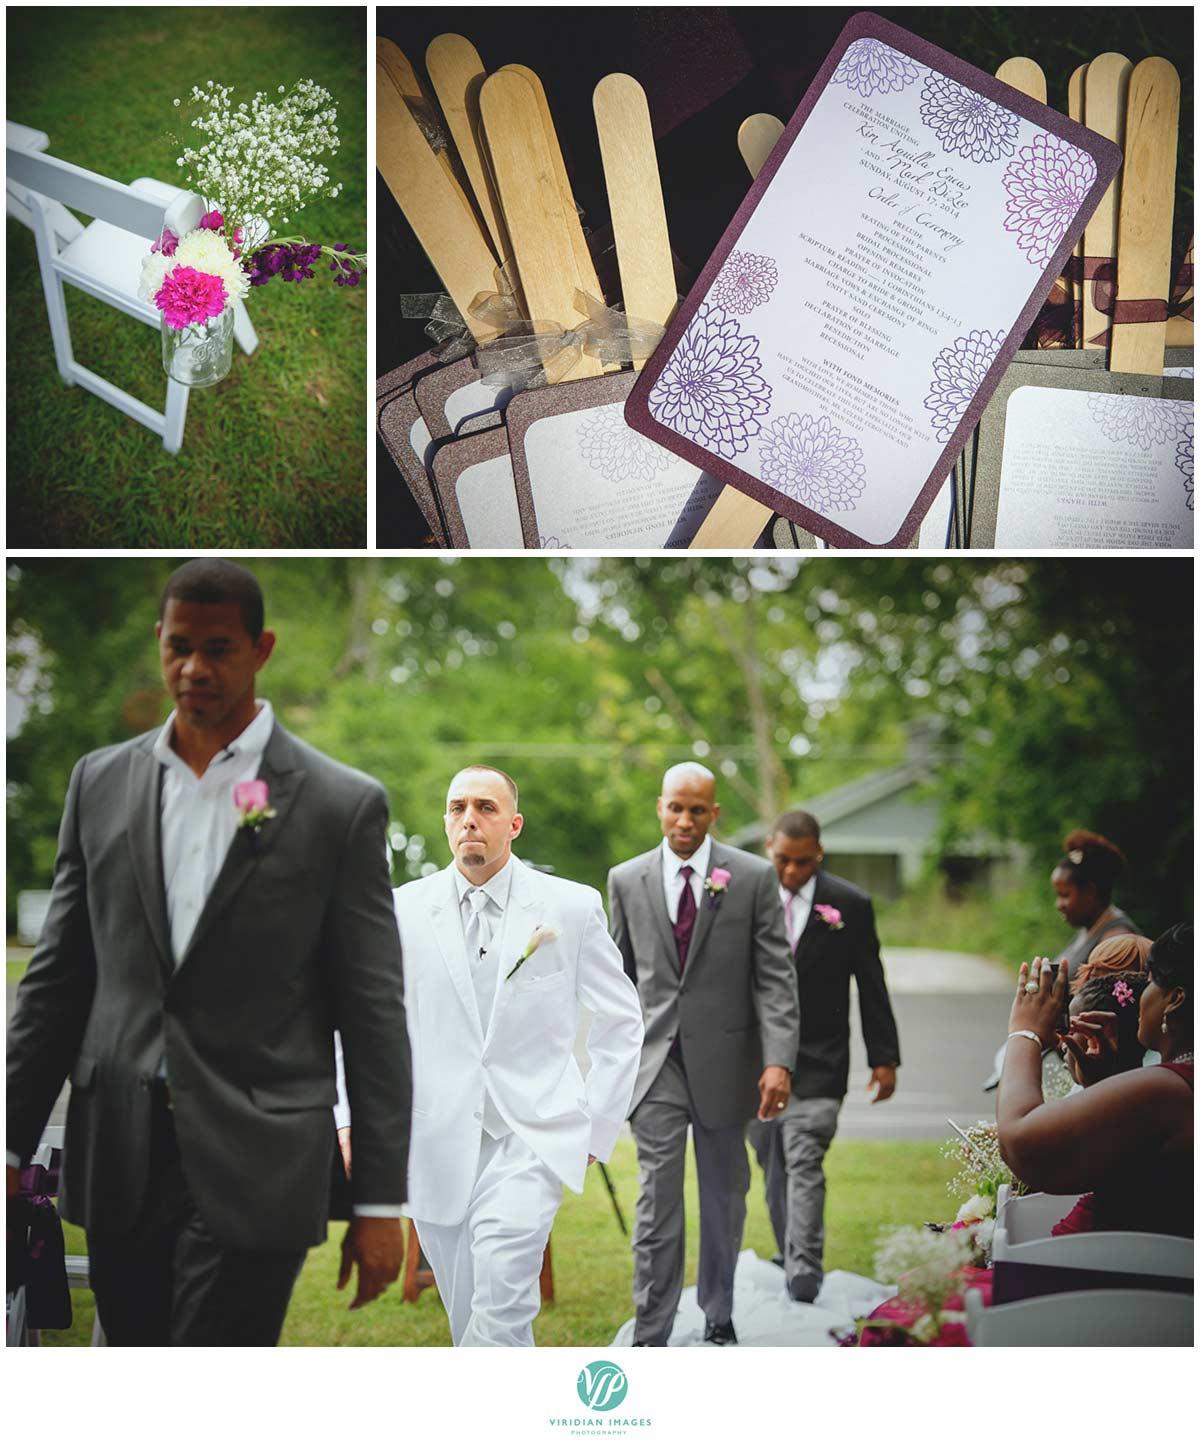 Atlanta-wedding-photographers-ceremony-white-tux-interracial-photo-6